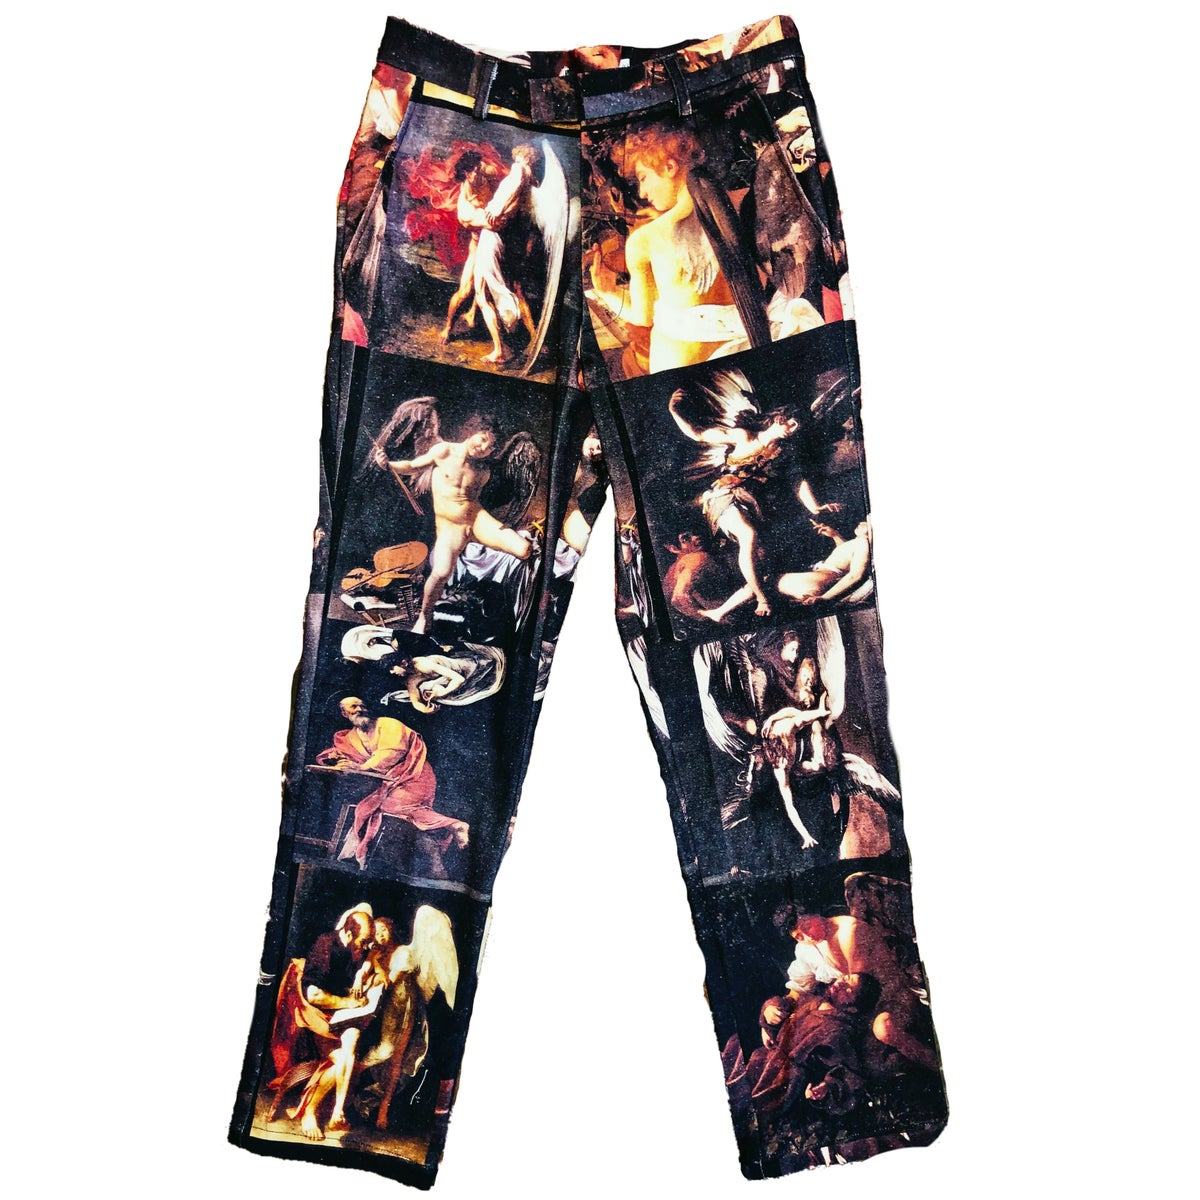 Image of Caravaggio Pants